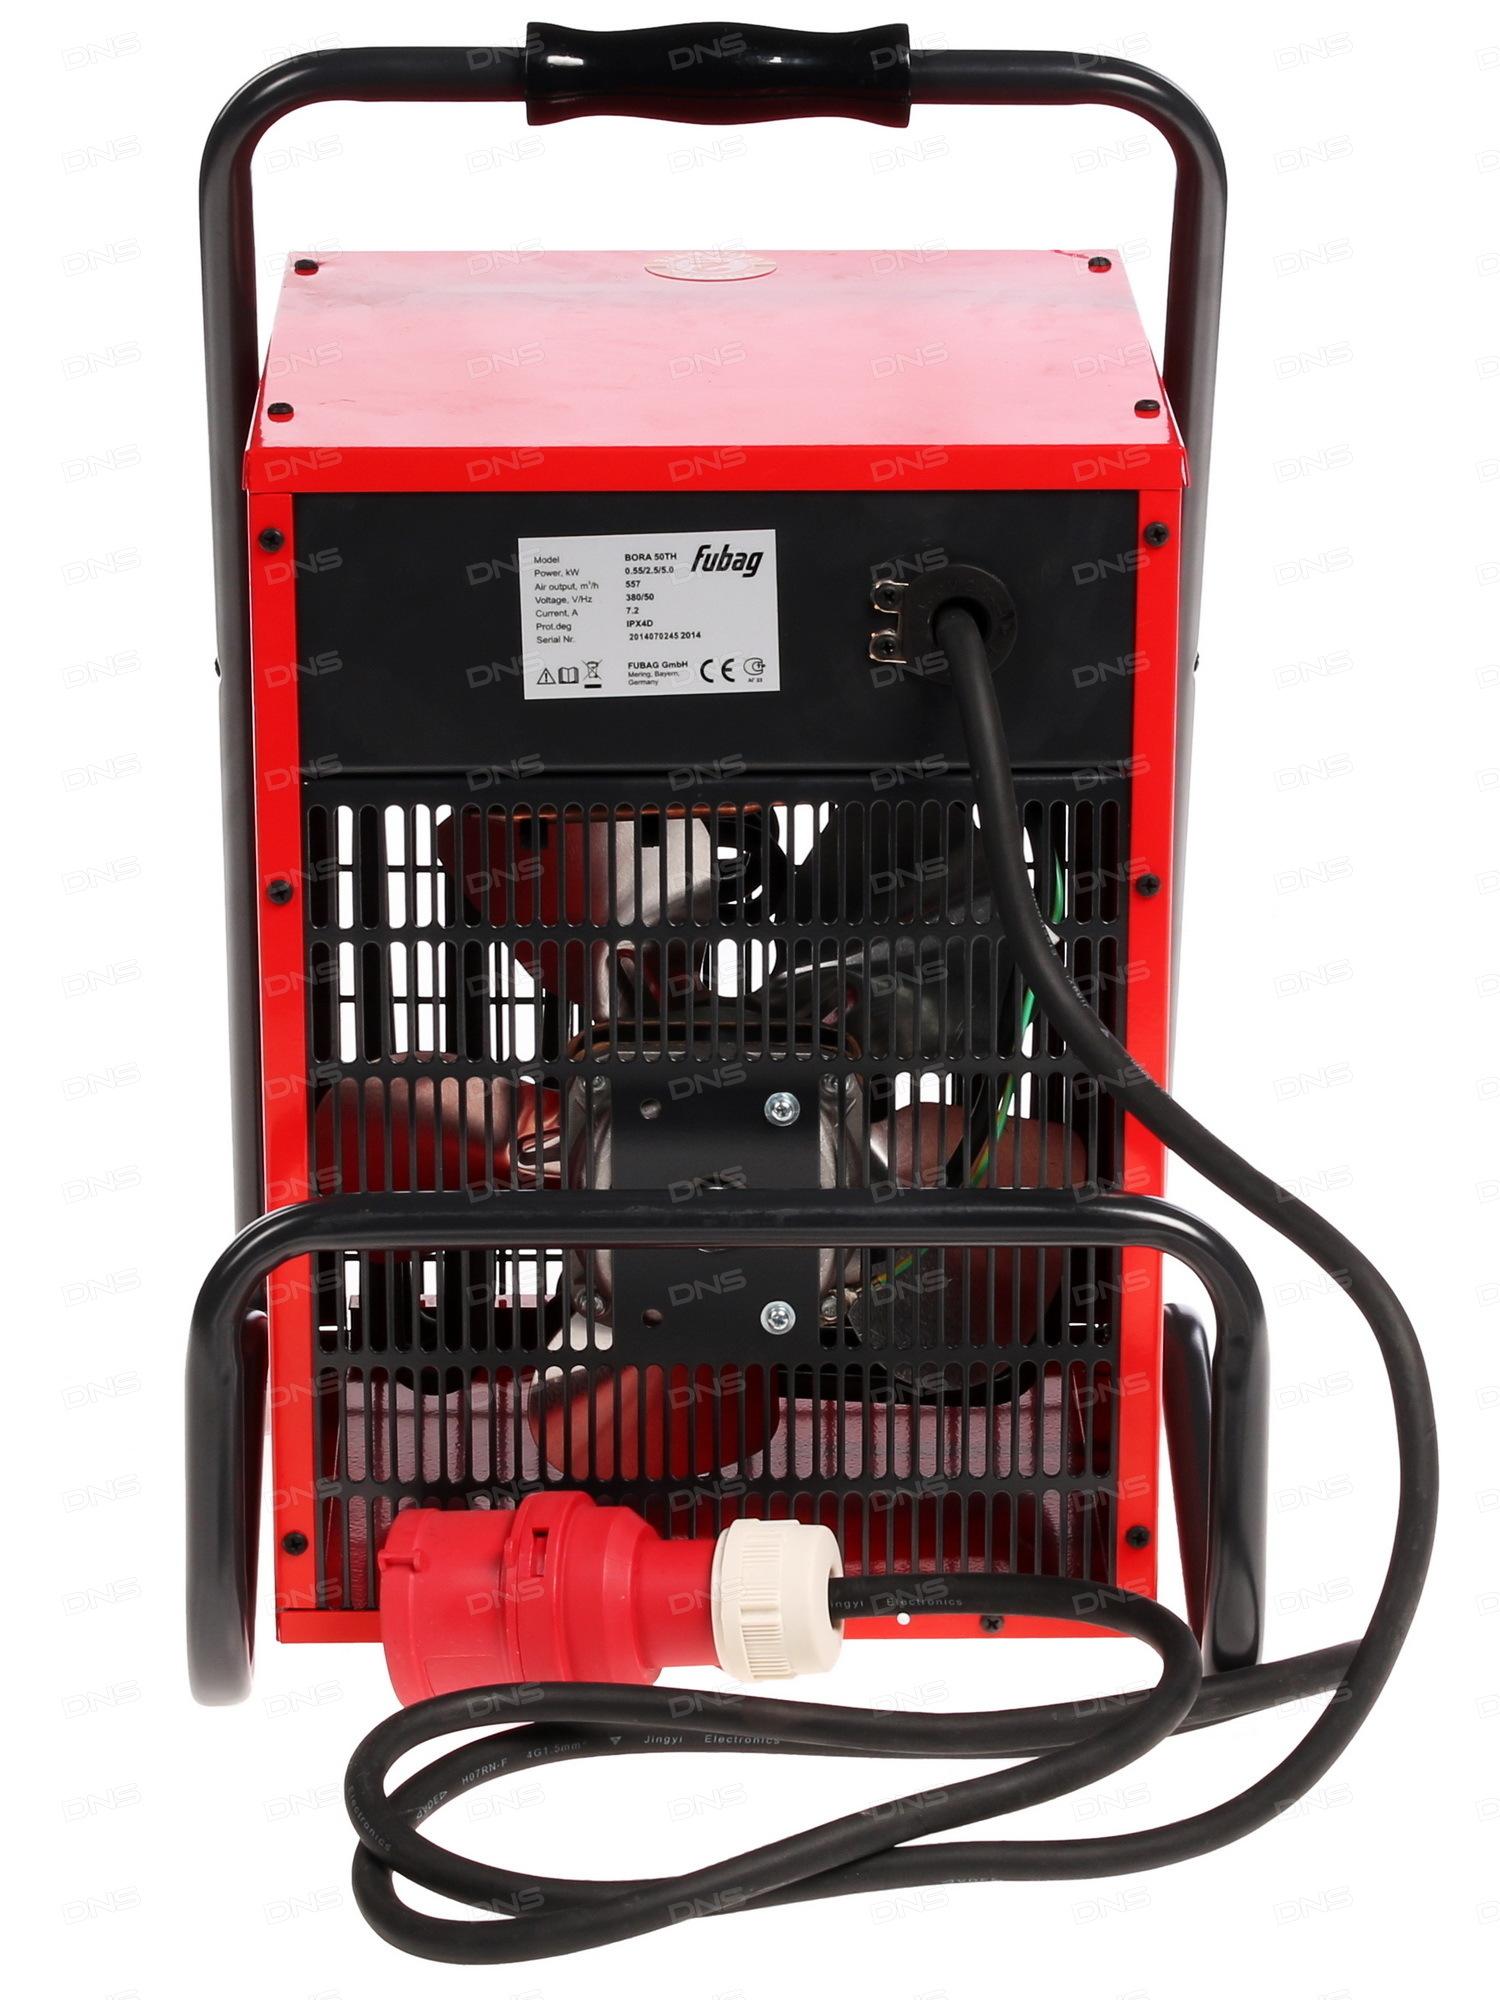 Тепловая электрическая пушка на 380в.  цена от 8000р